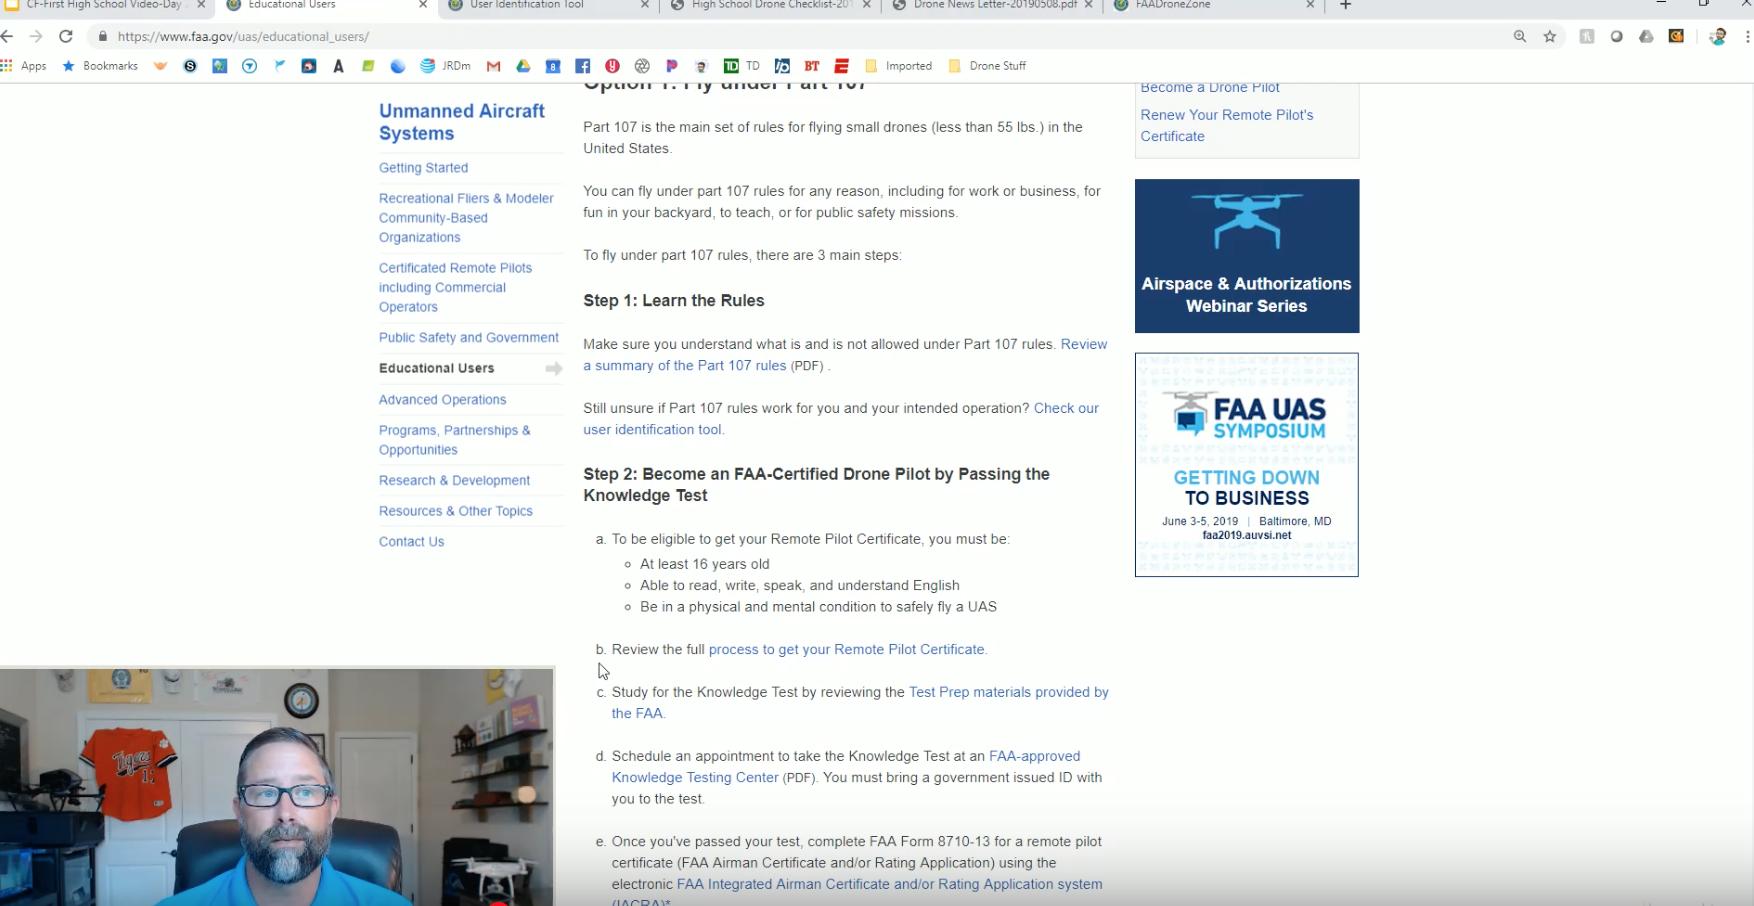 Drone Use In Schools Video 2 – FAA Regulations